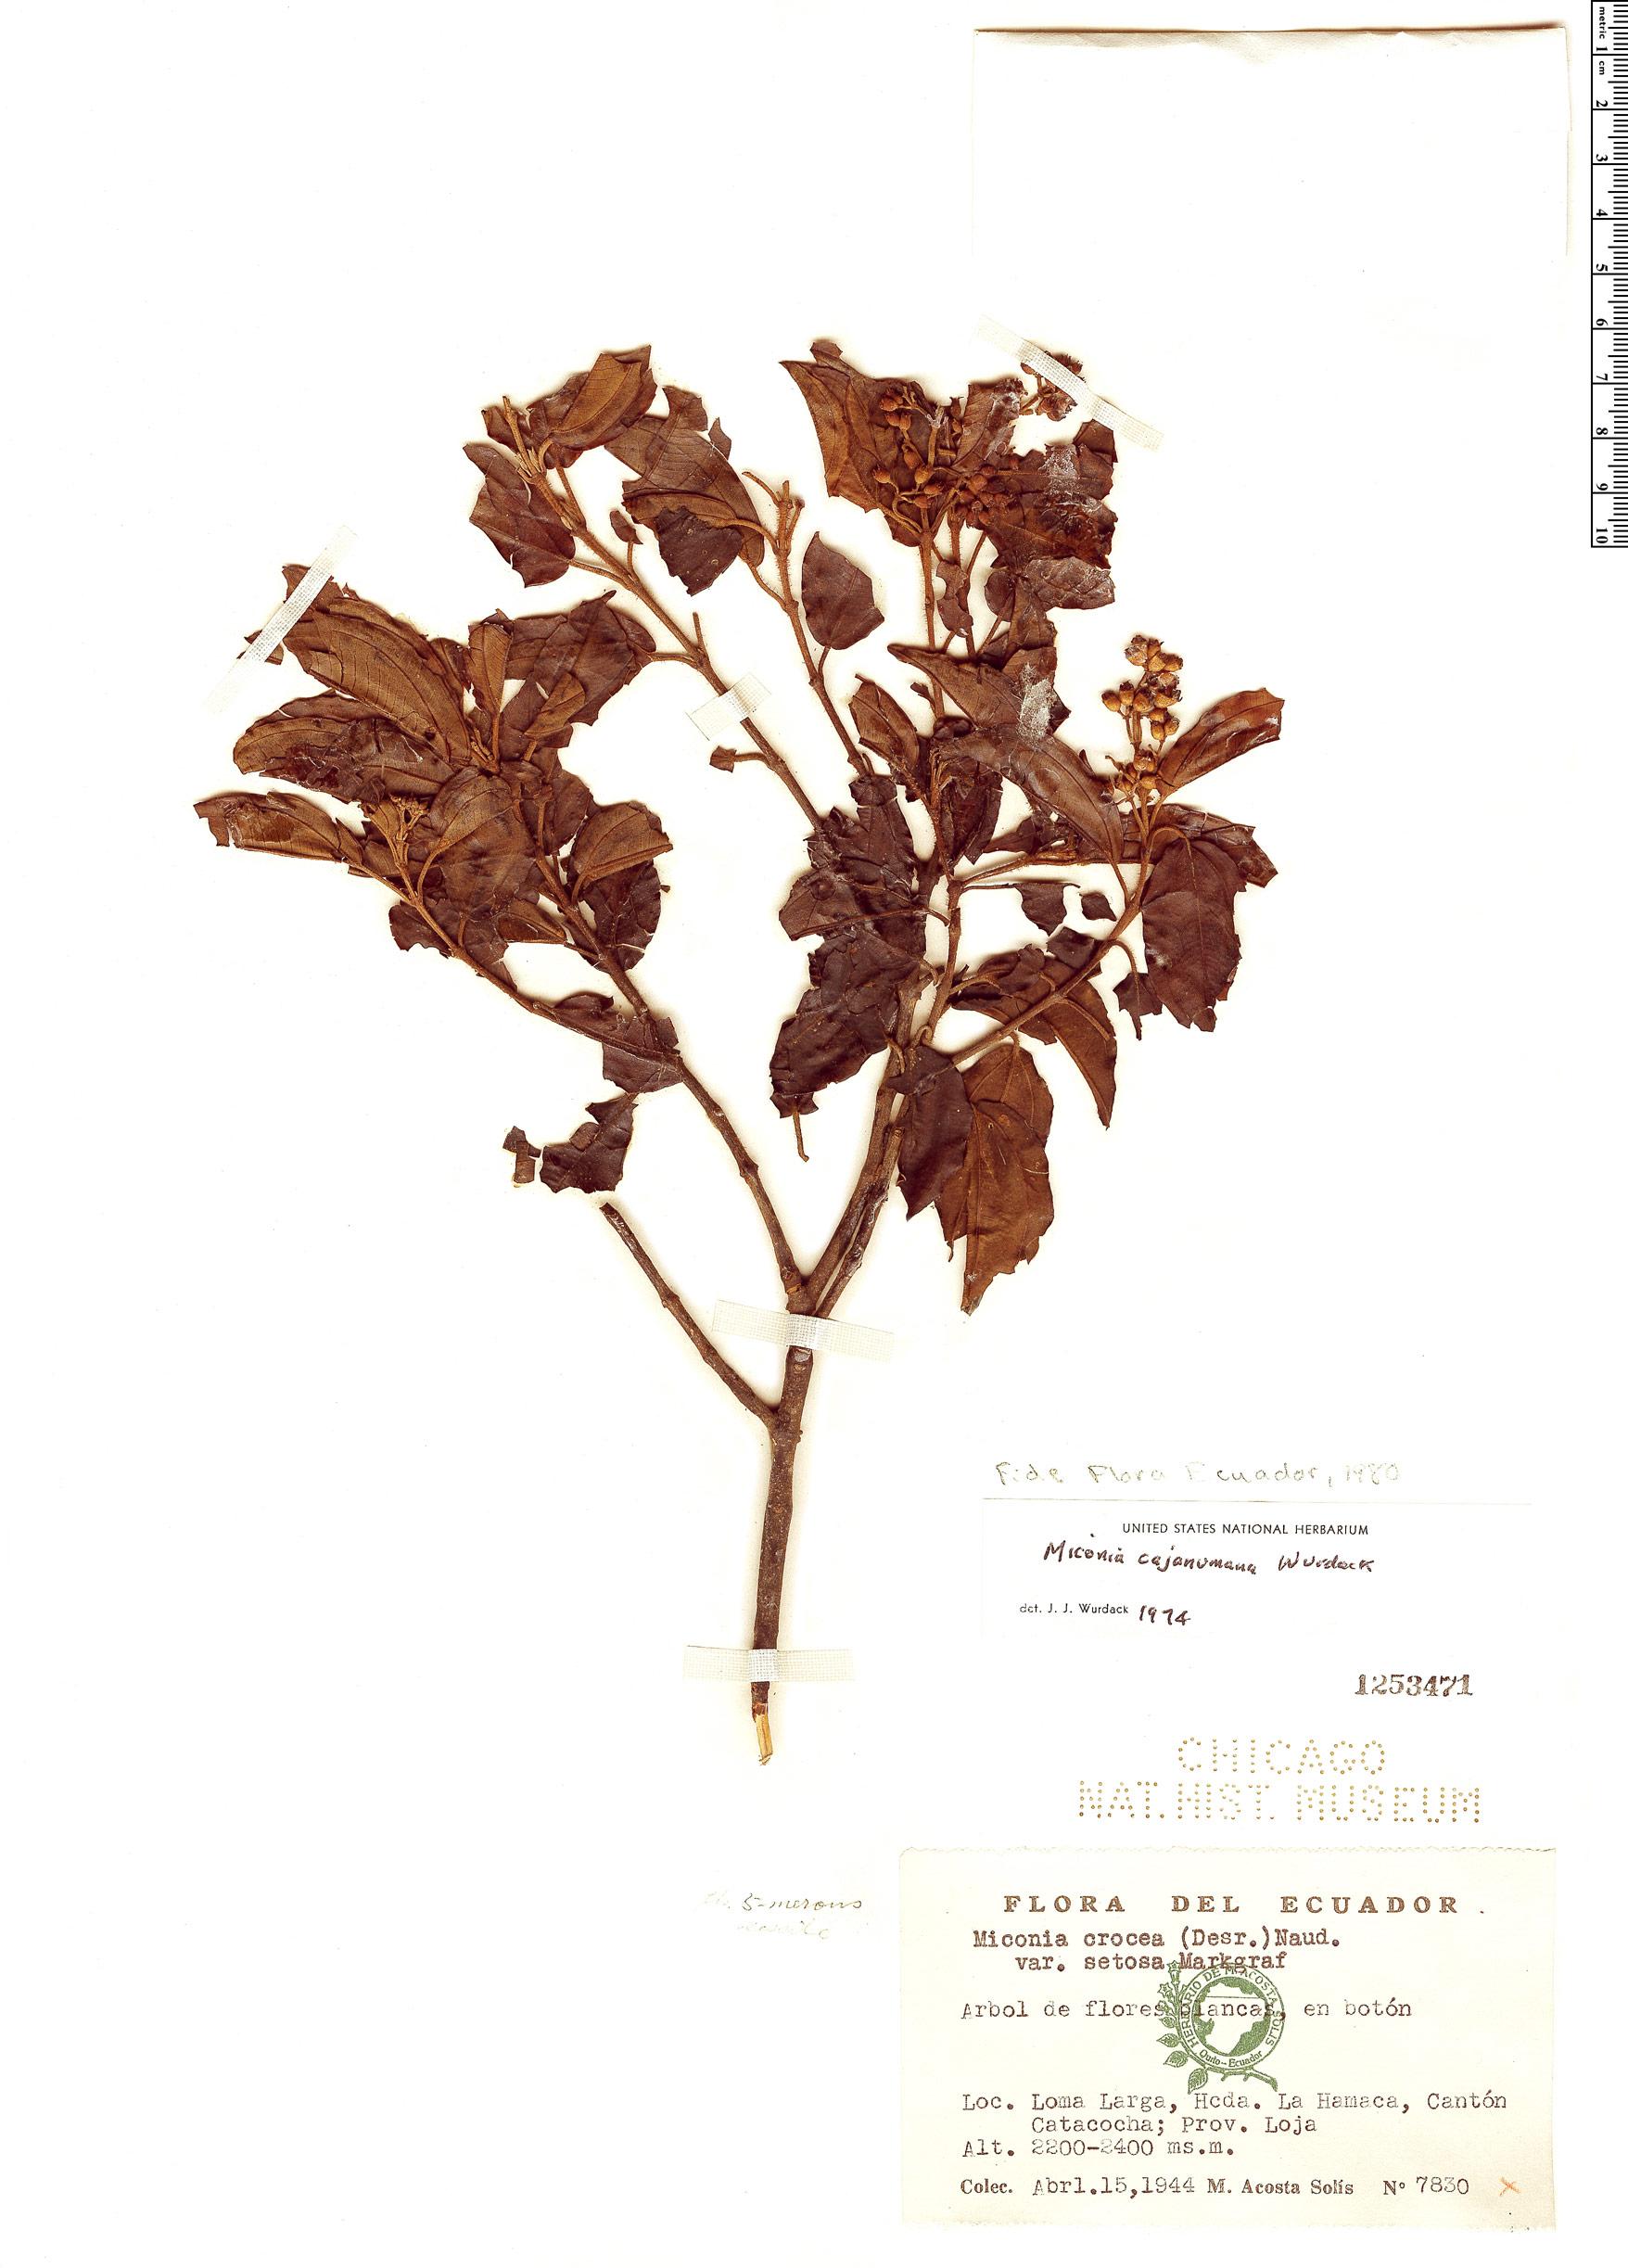 Specimen: Miconia cajanumana